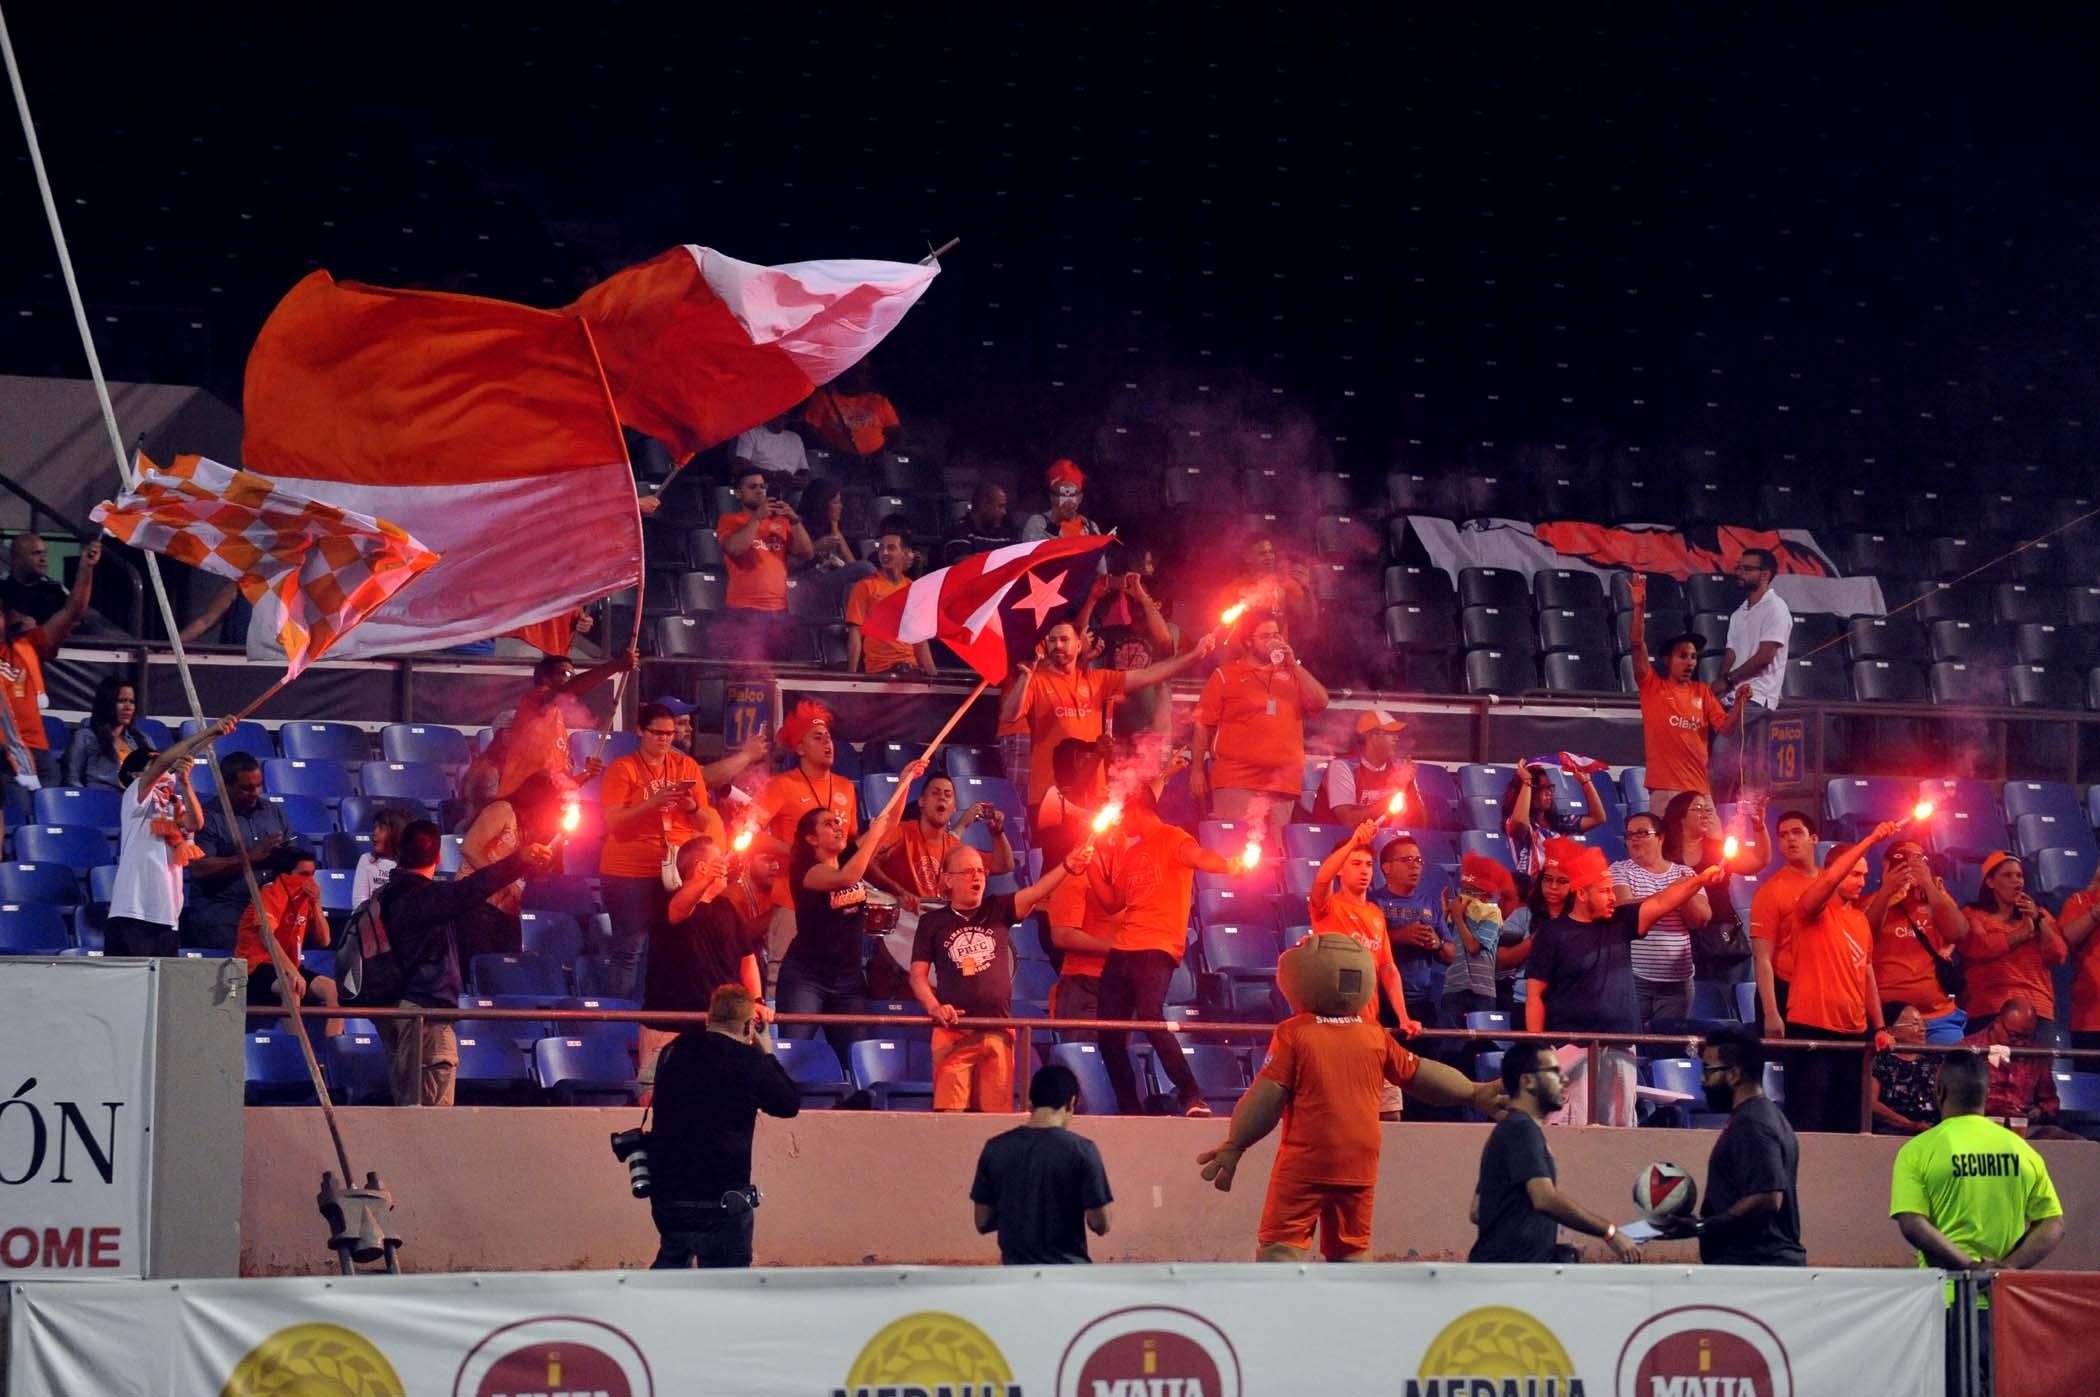 Público del equipo naranja